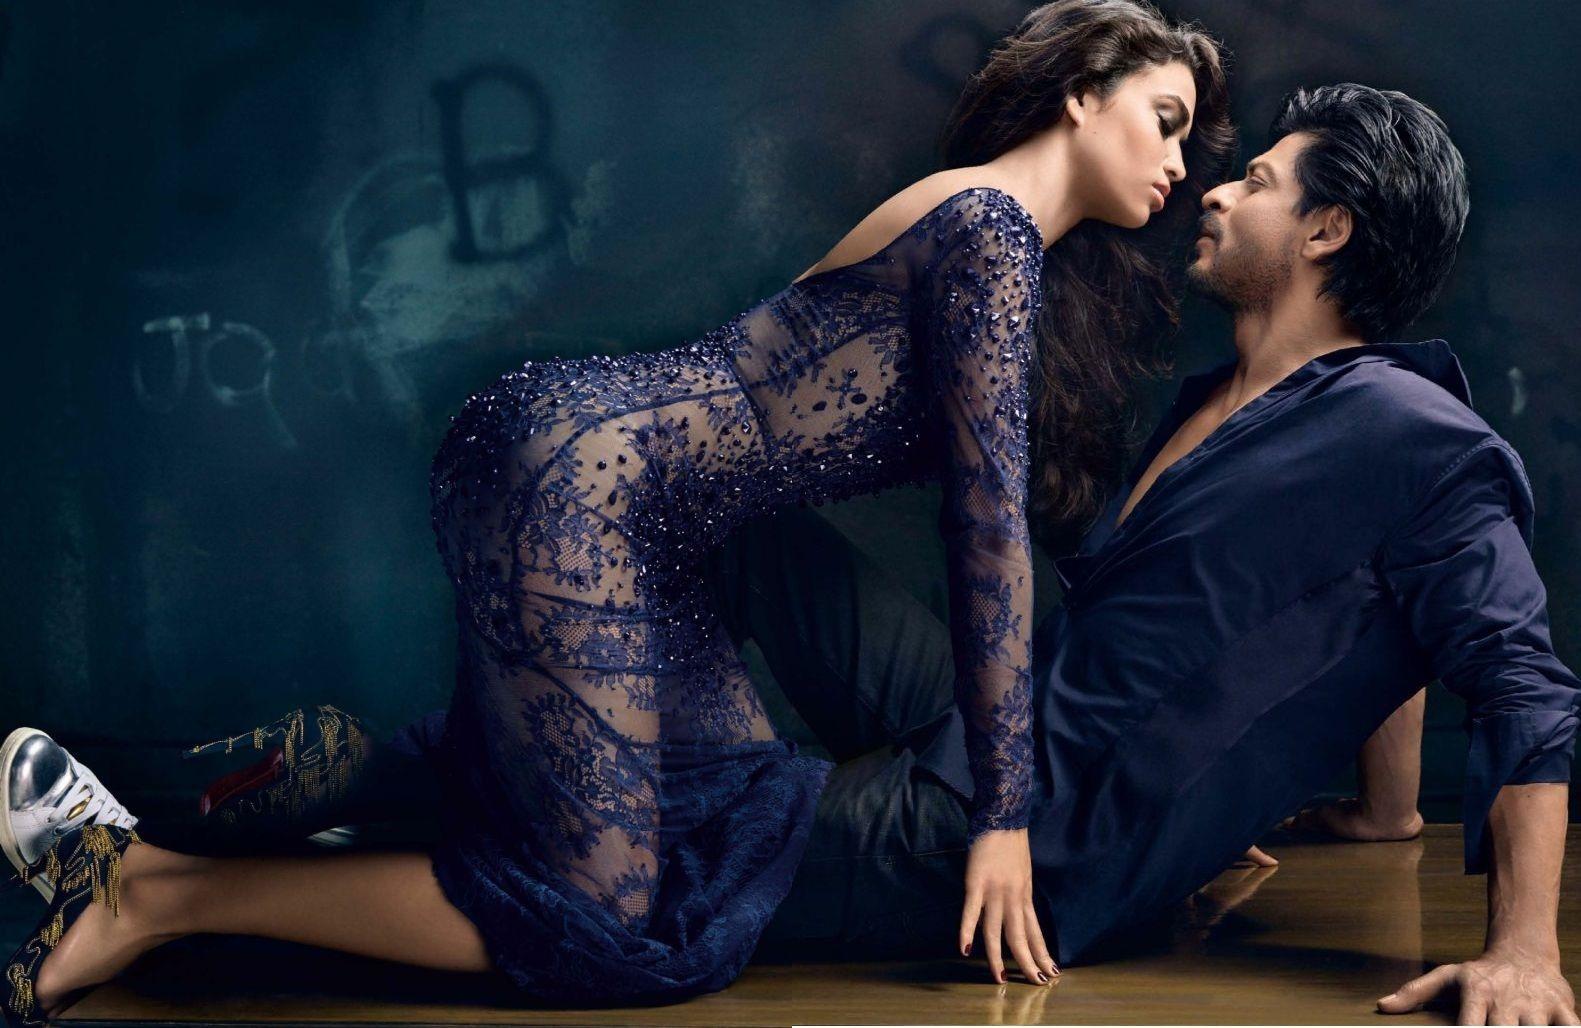 Image result for ShahRukh Khan hot Vogue Photoshoot with Victoria's Secret Supermodel Shanina Shaik